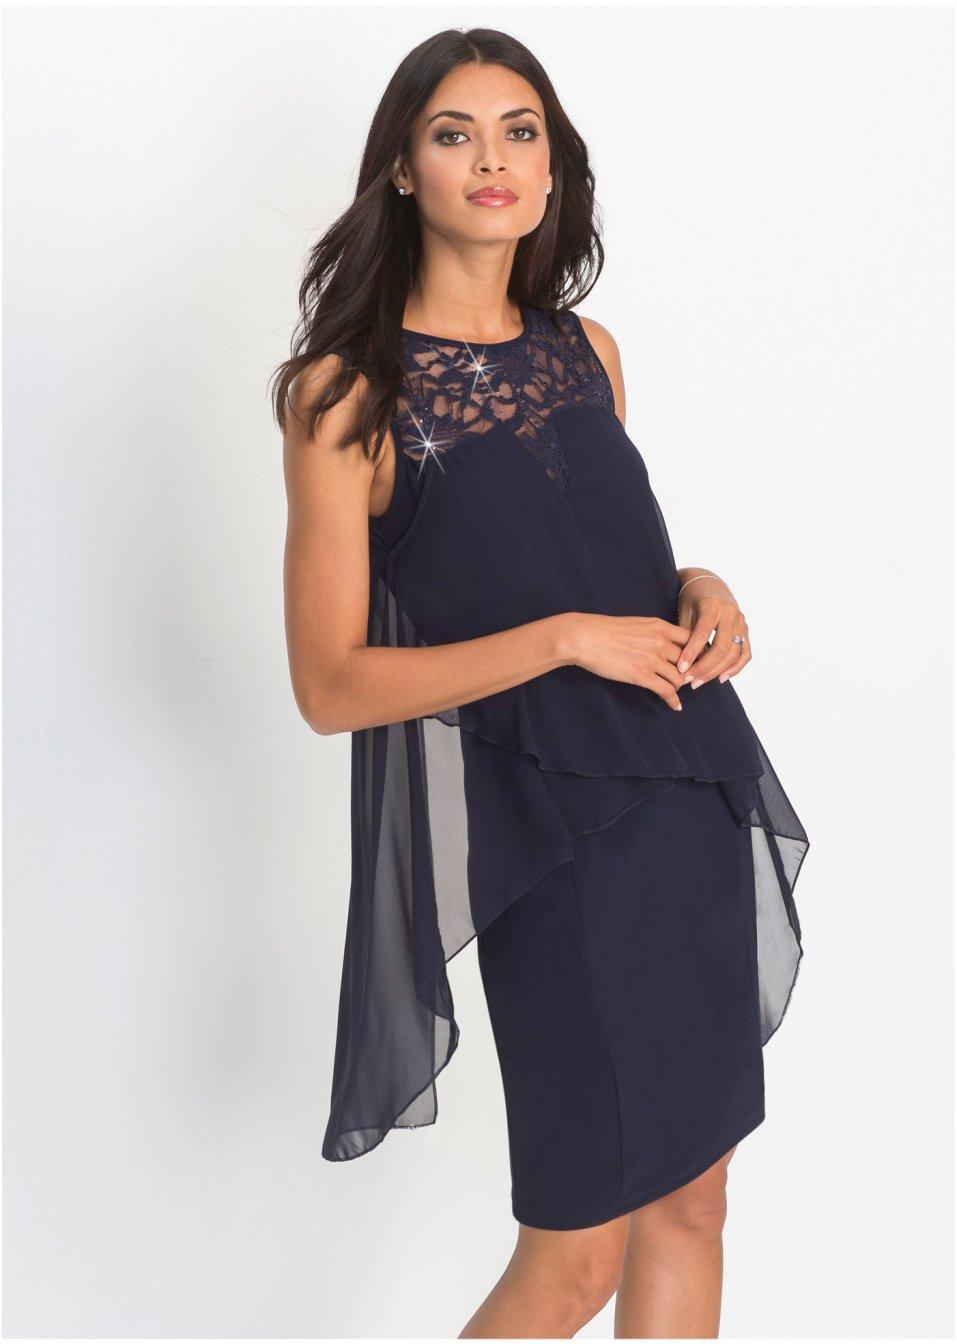 Apartes Kleid mit Pailletten - mitternachtsblau 9113d2f0cc